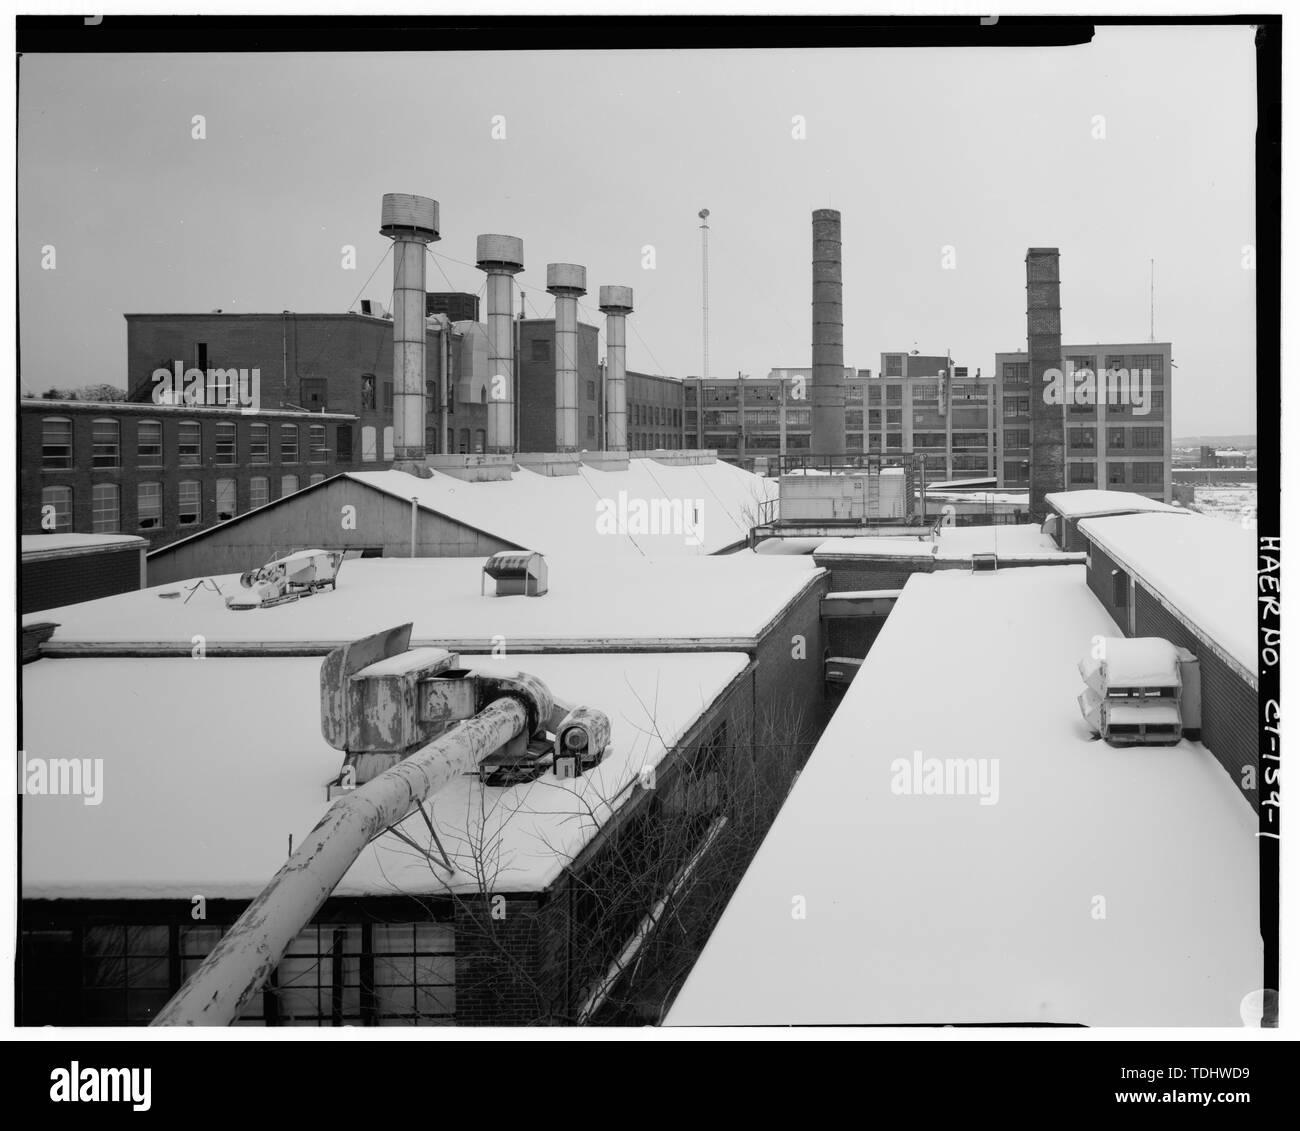 Orange Grove Black and White Stock Photos & Images - Alamy